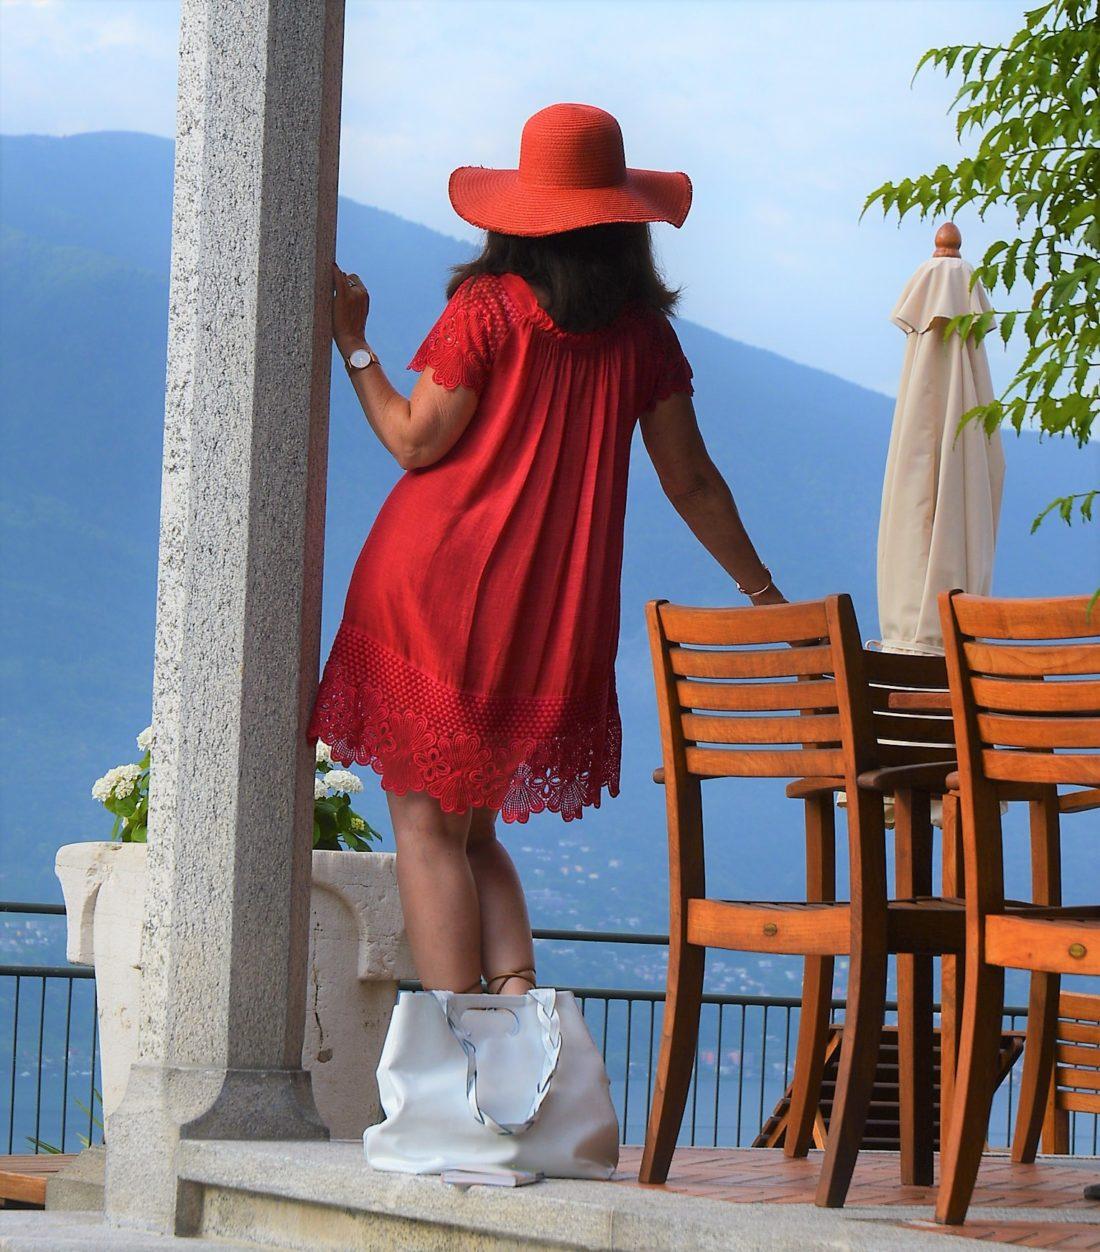 Rotes Kleid mit rotem Hut